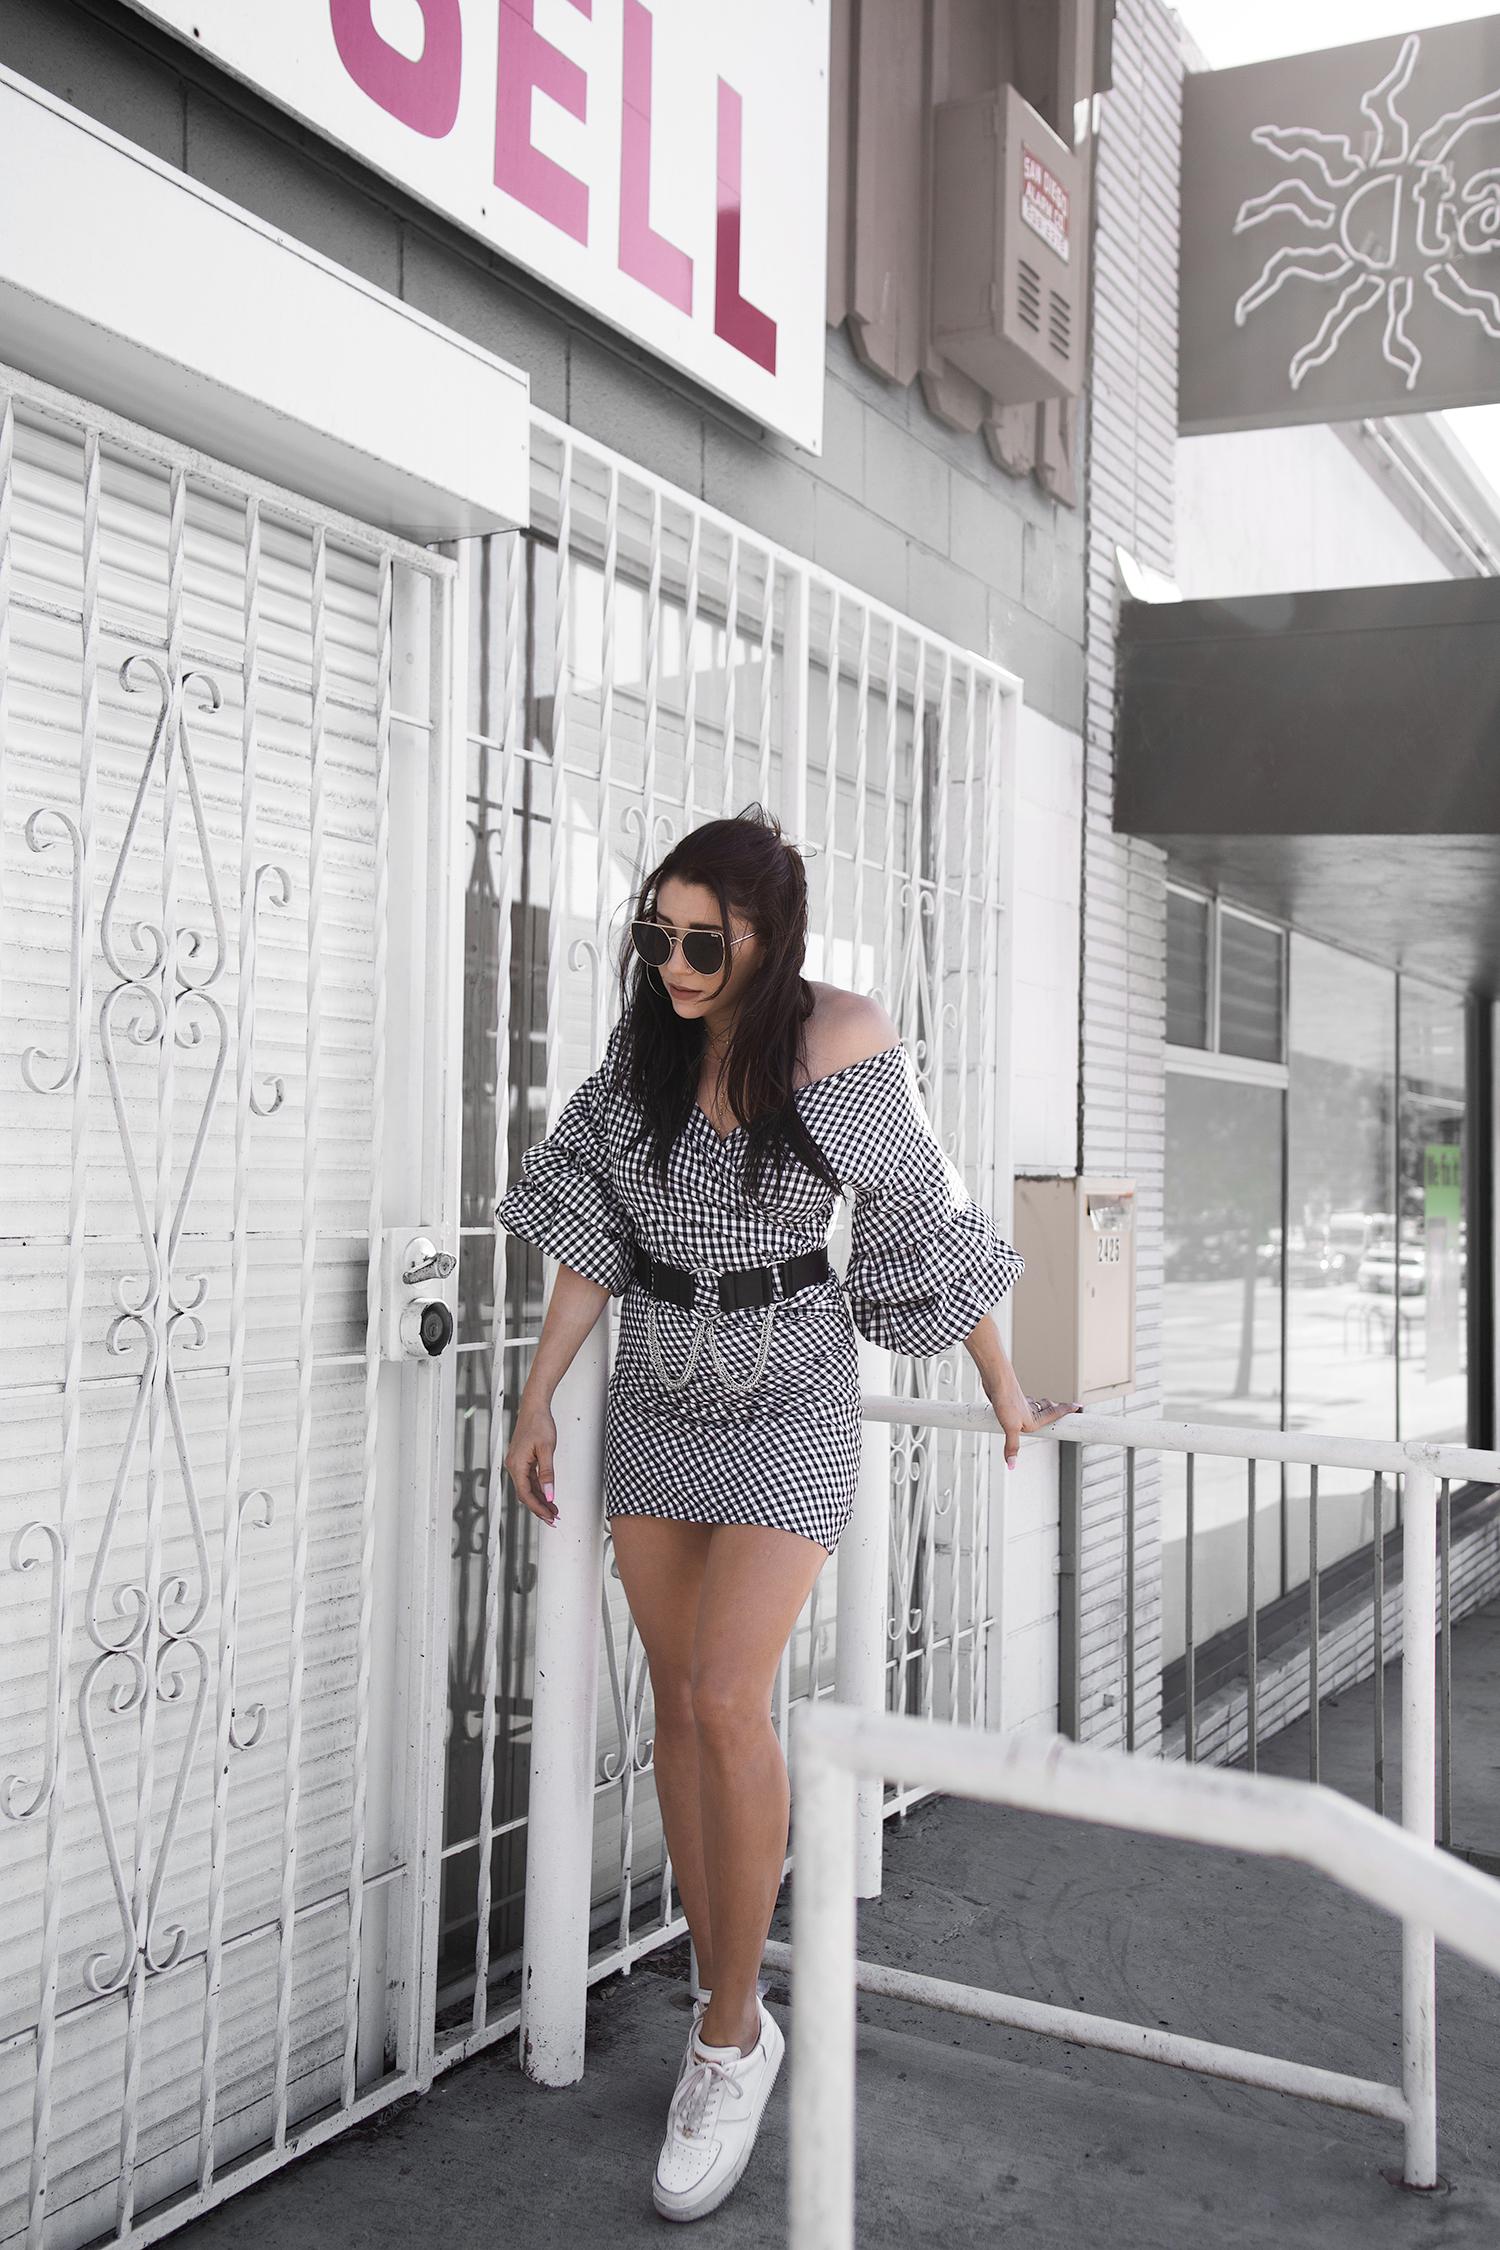 fashionlush, My Blogging Story, gingham style